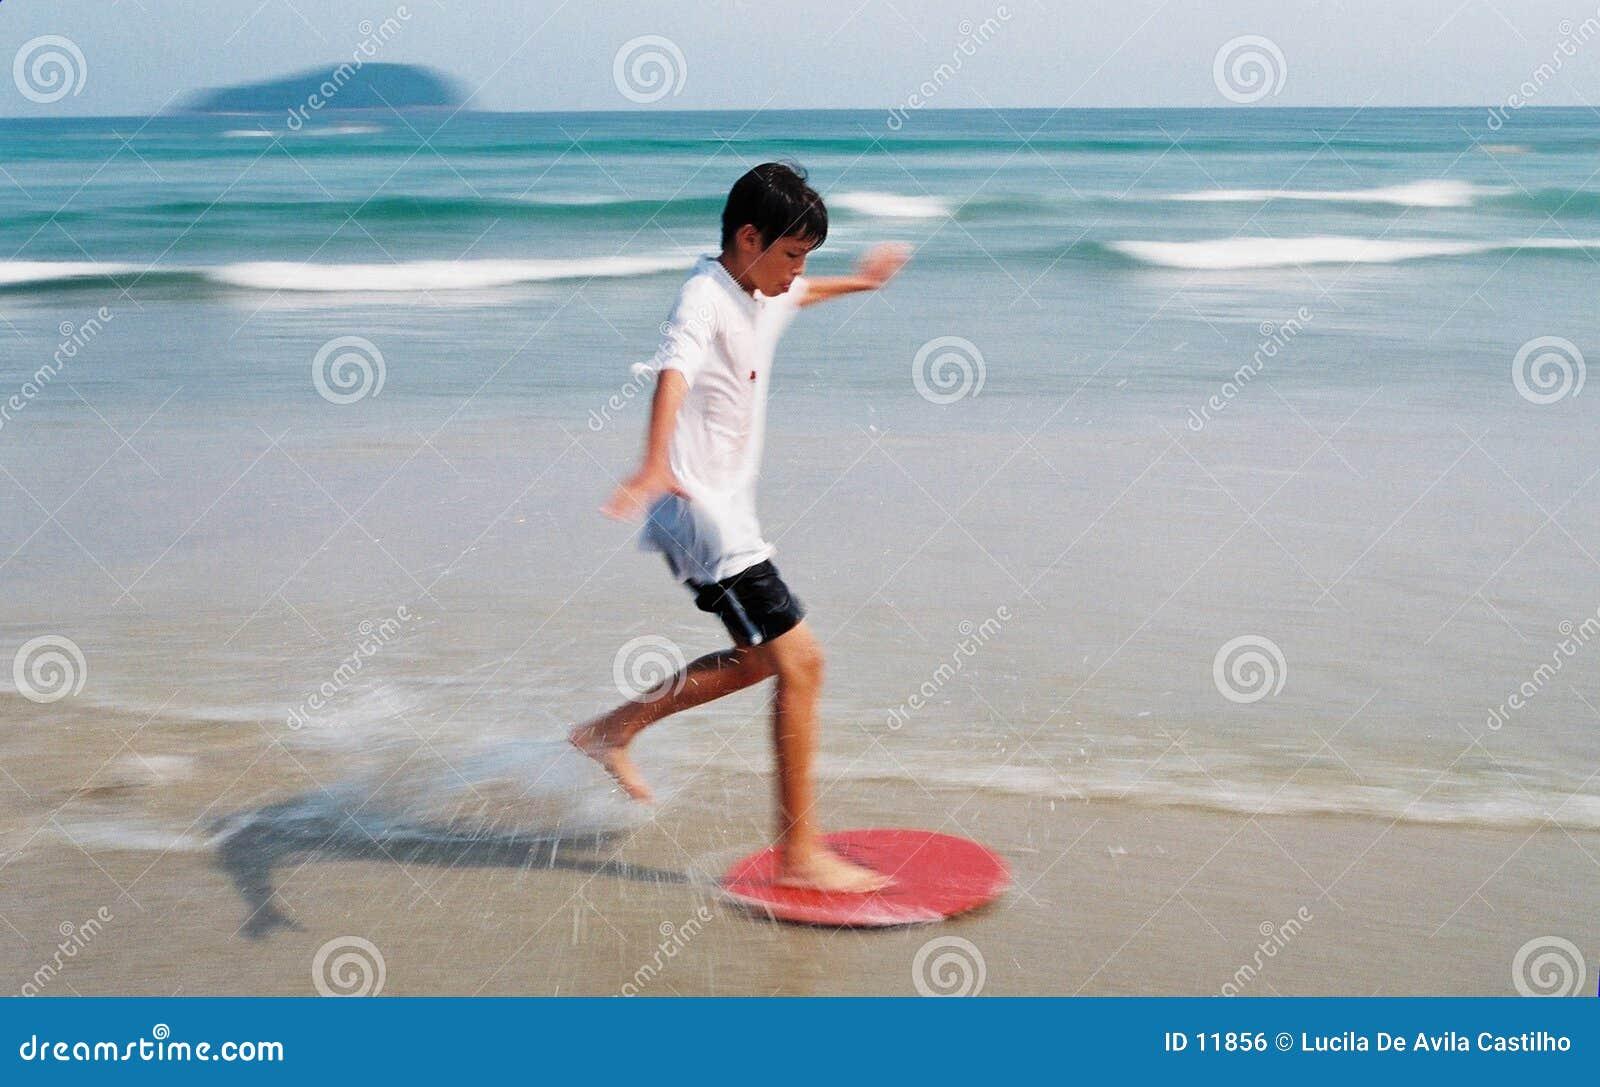 Muchacho que practica surf a través de ondas